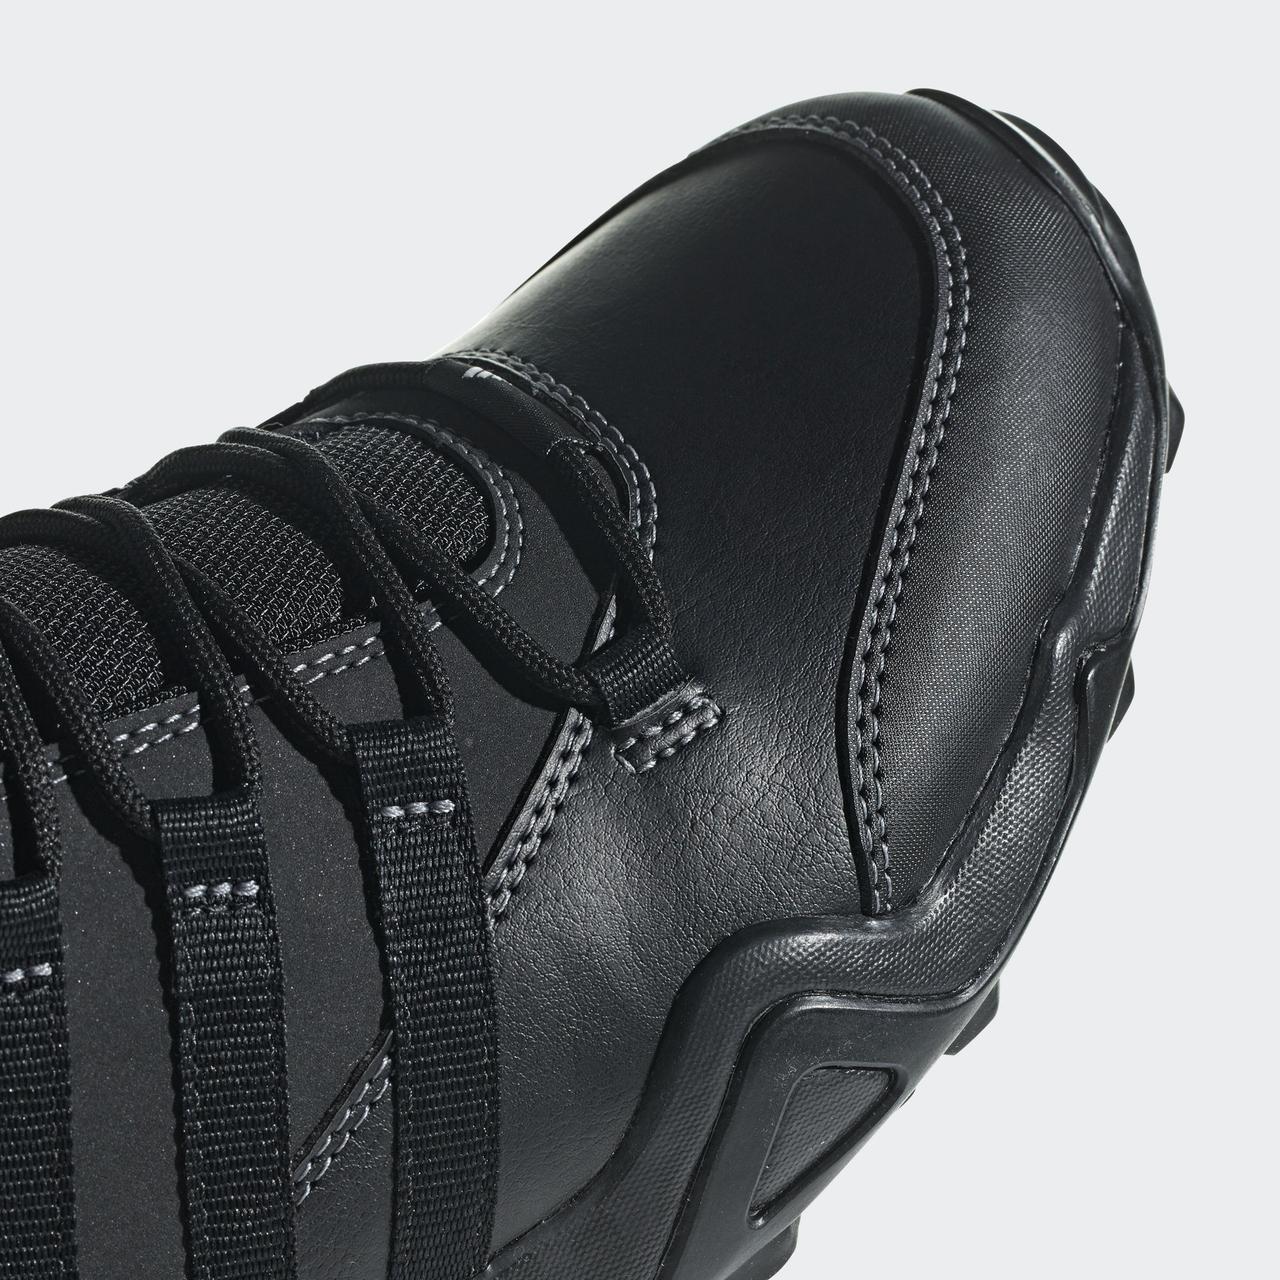 ... фото Мужские кроссовки Adidas Performance Terrex AX2R Beta Mid  Climawarm (Артикул  S80740), фото 54d3d1cd1c8